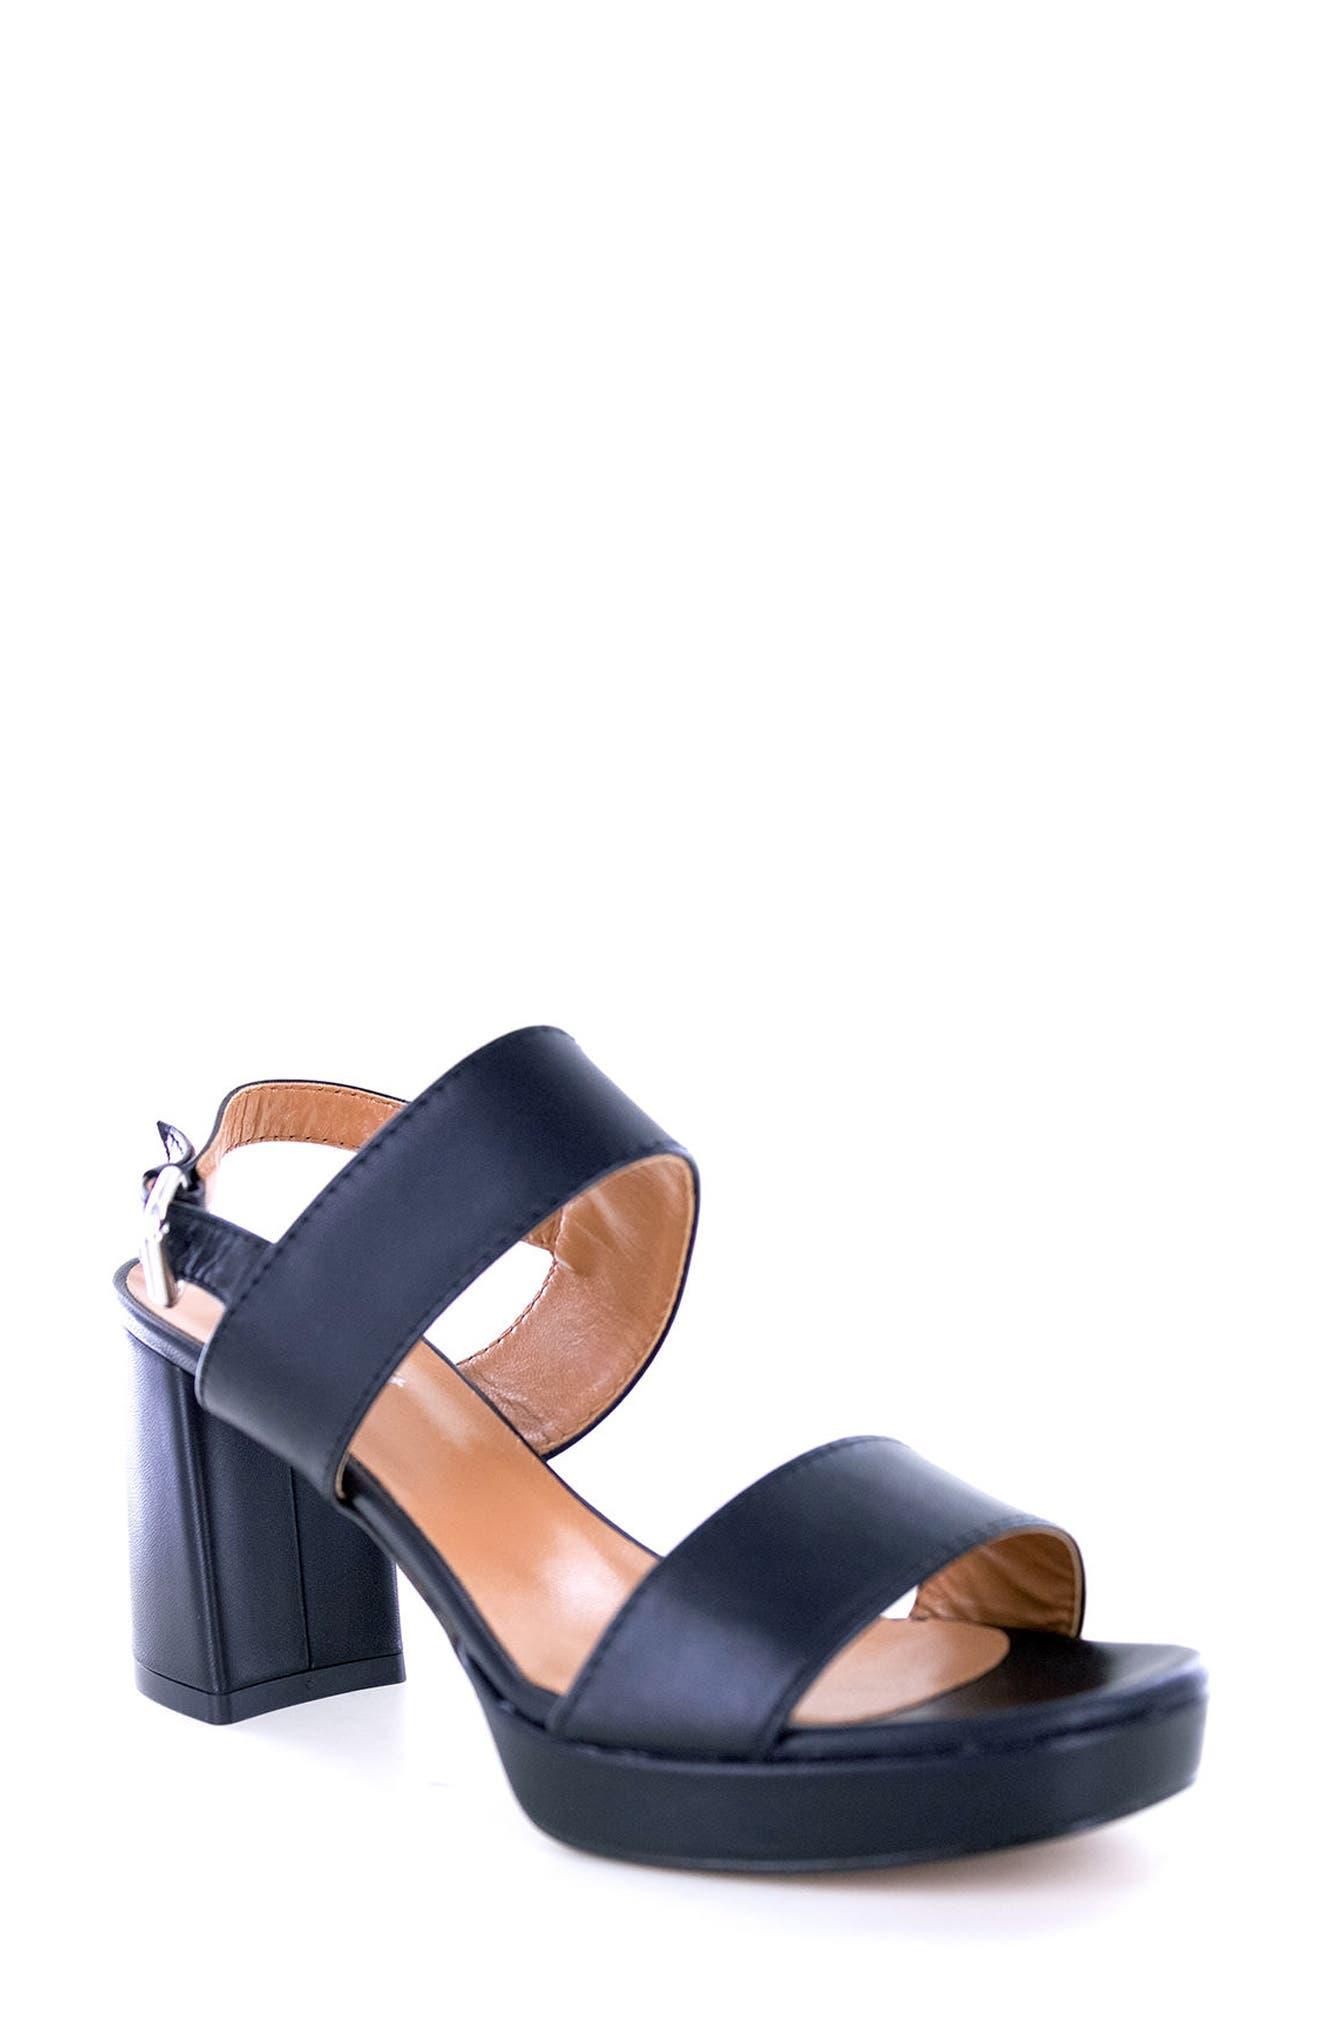 Summit Emilia Block Heel Sandal,                         Main,                         color,